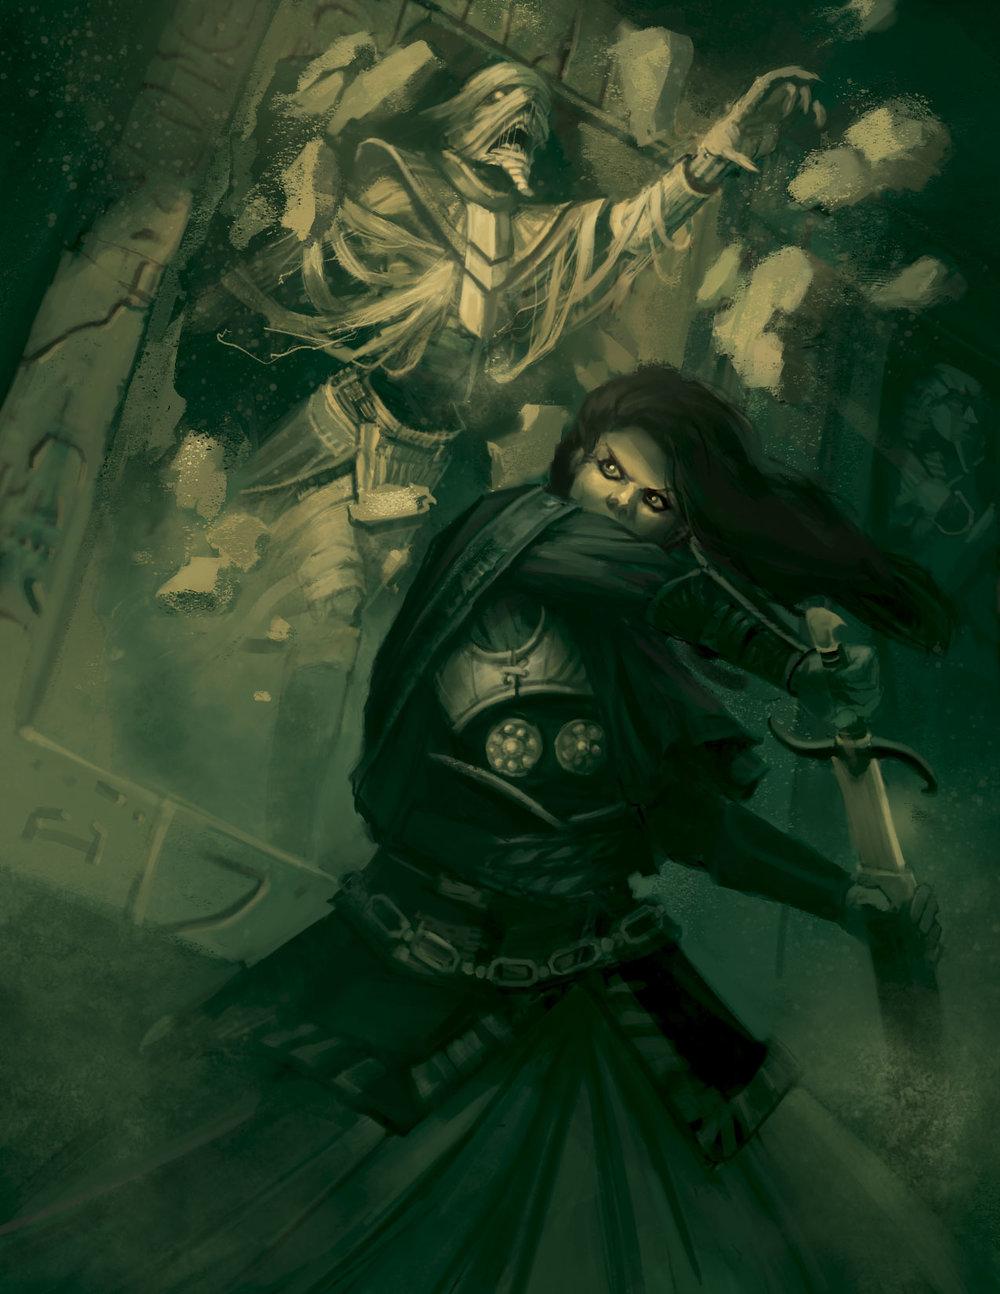 Stygian Mummy - Conan RPG Copyright © Modiphiüs Entertainment